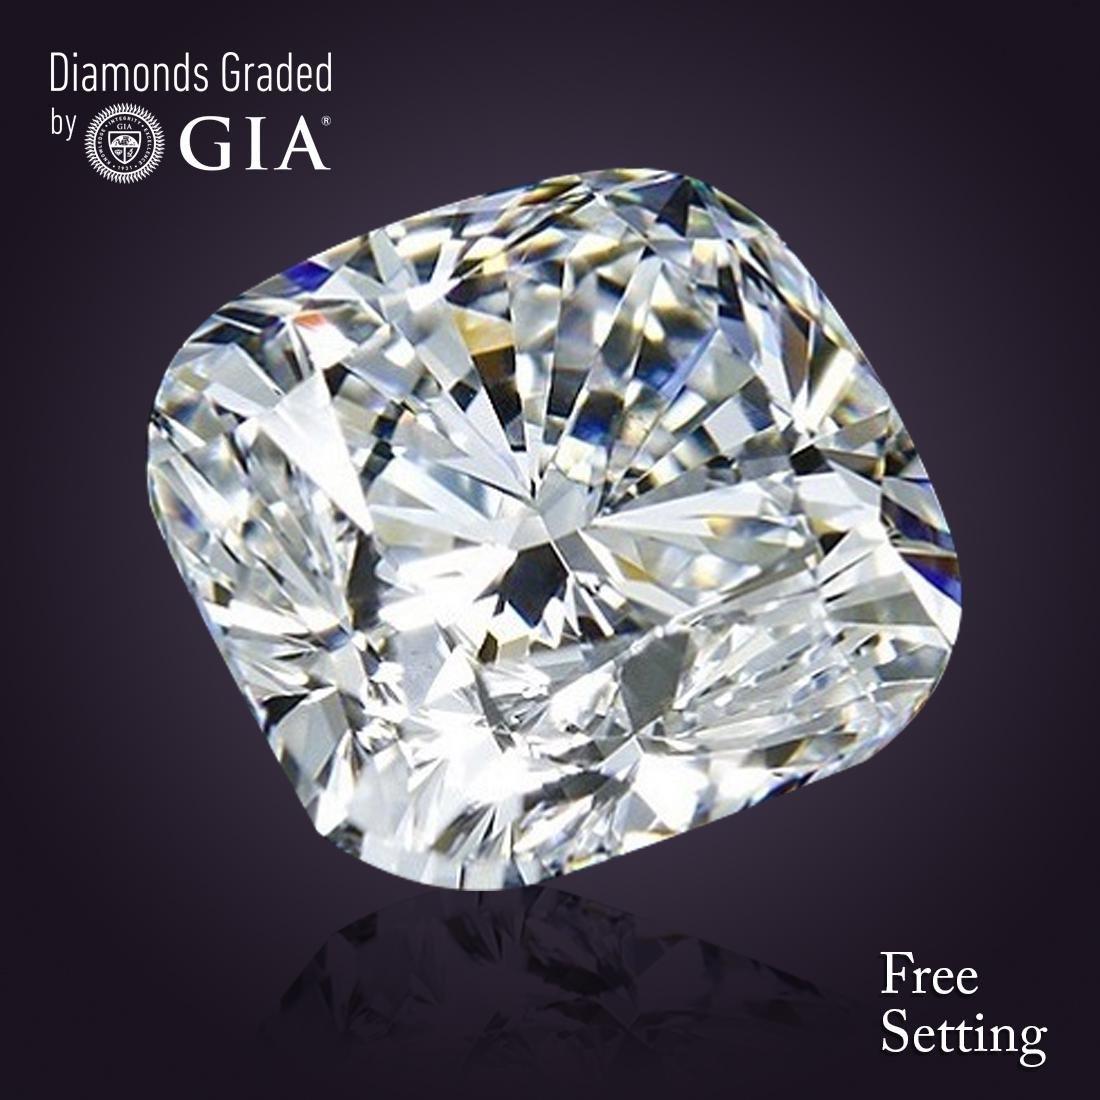 2.00 ct, Color F/VS1, Cushion Bri. cut Diamond 46% Off